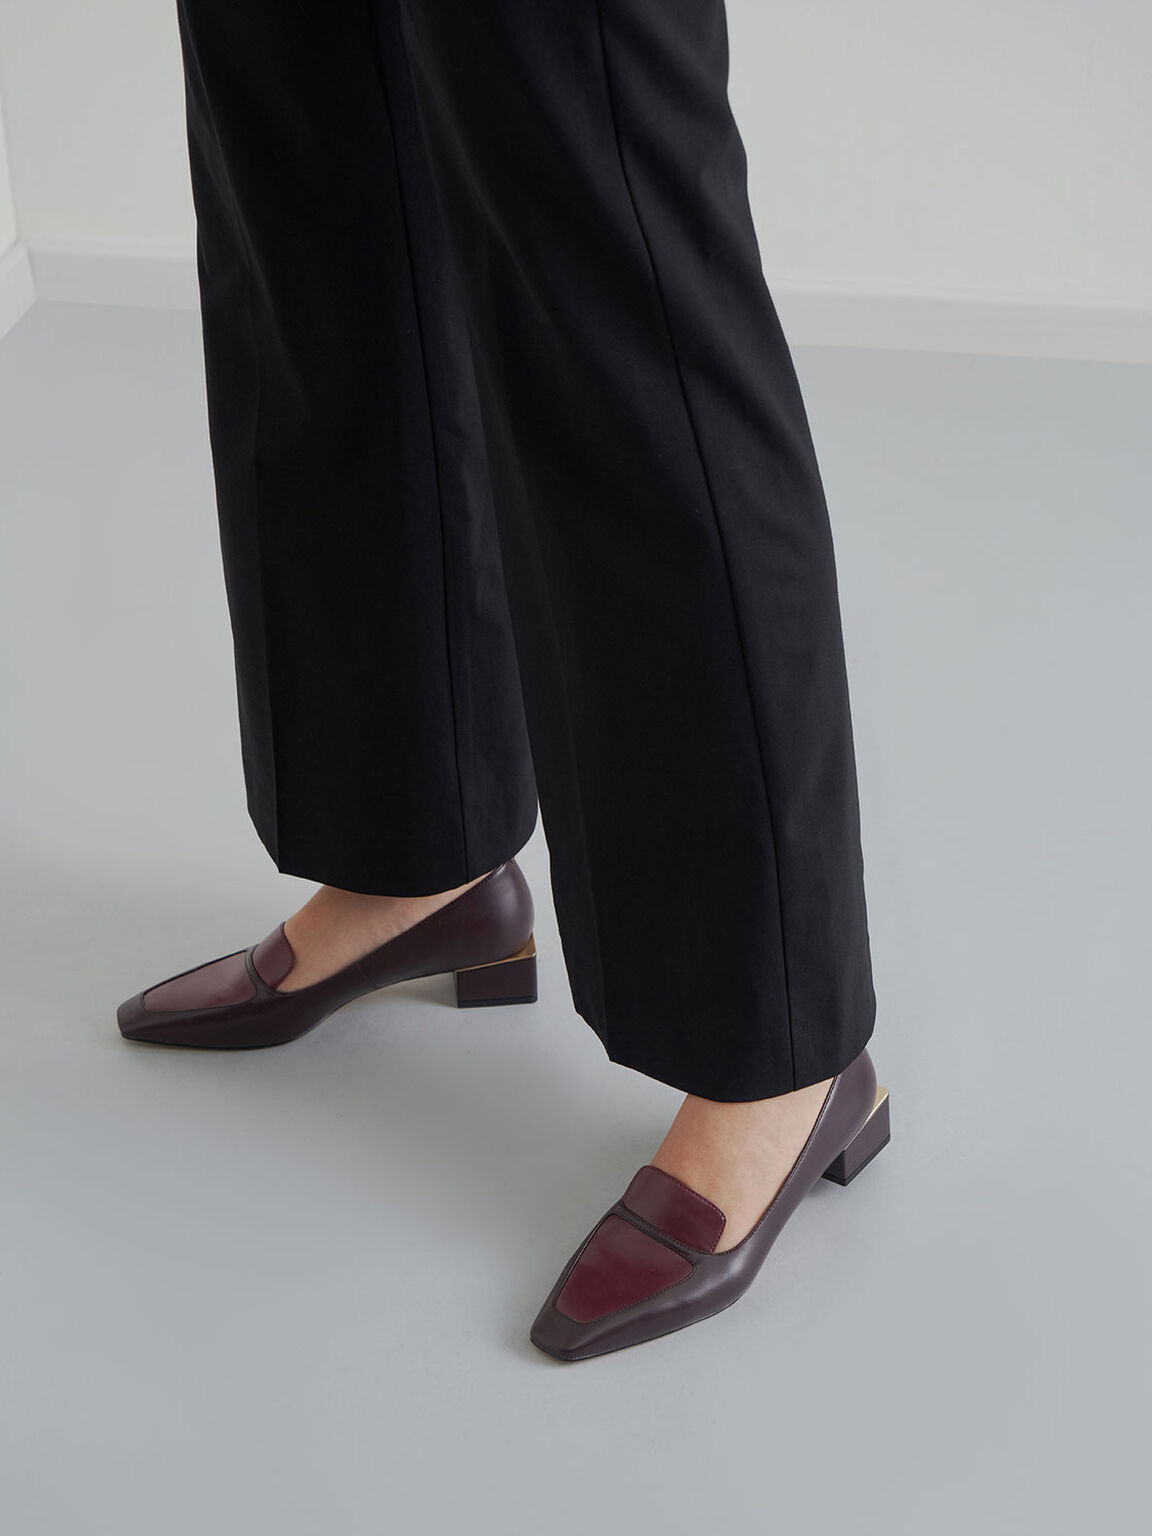 Block Heel Loafers, Burgundy, hi-res